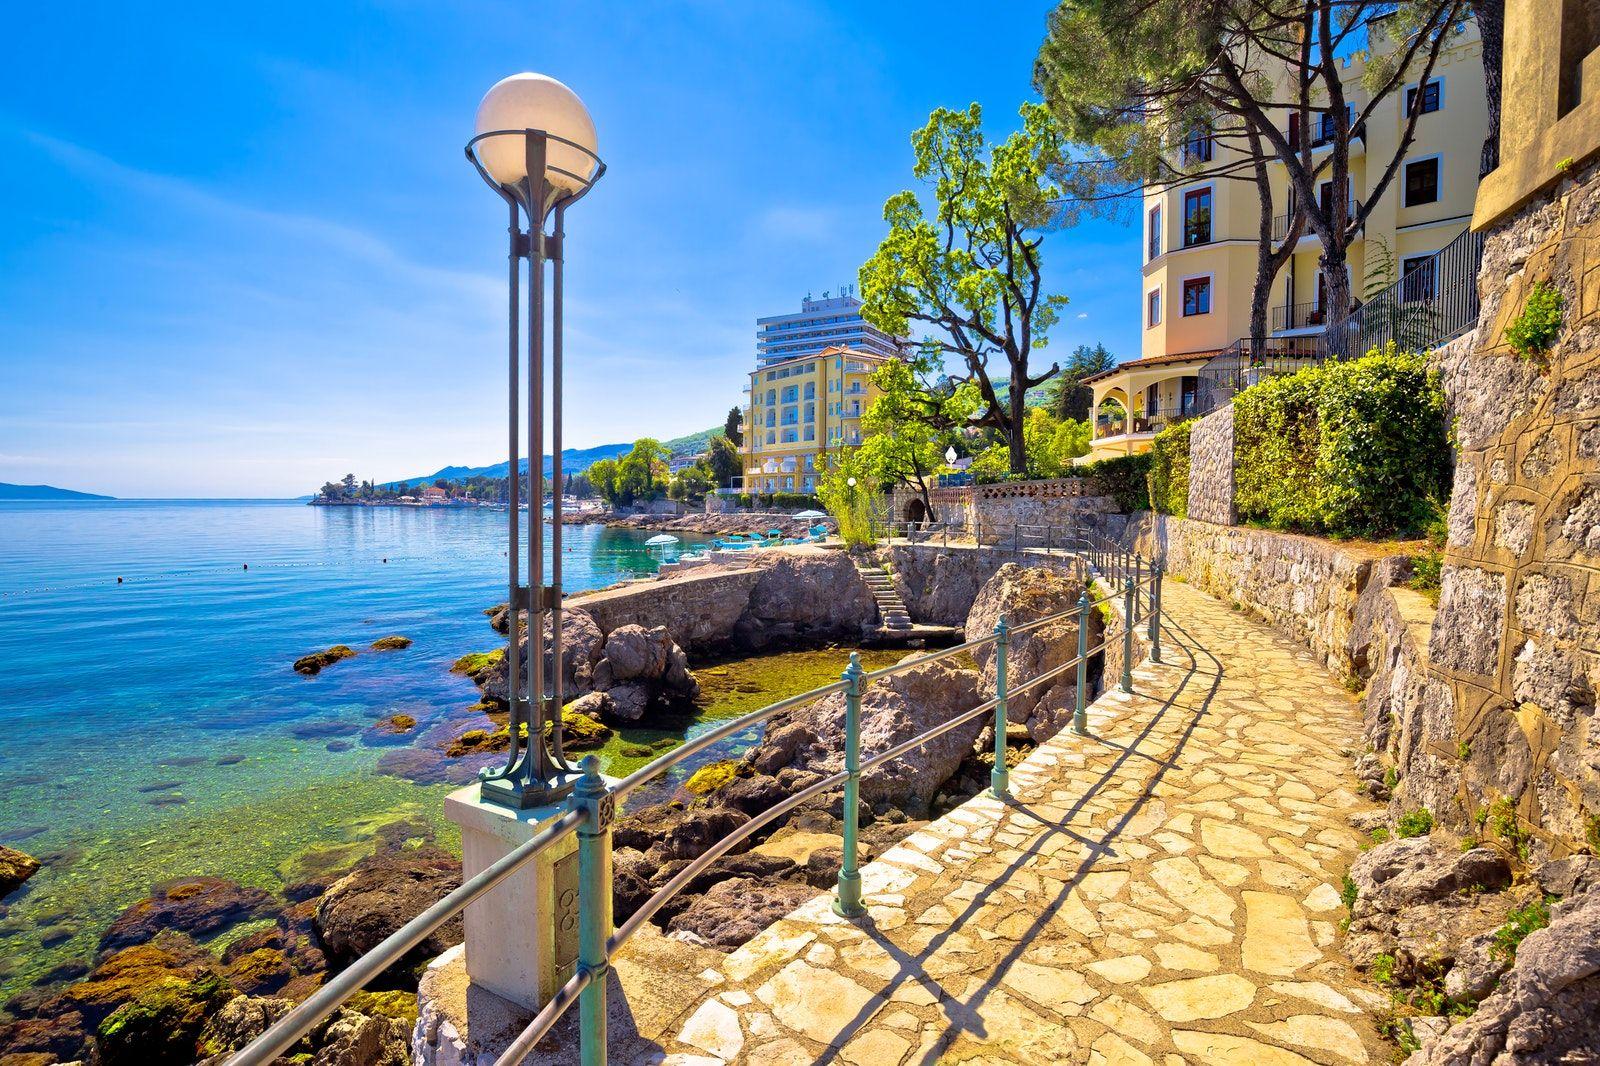 Visit Have A Walk Along Lungomare Opatija Places To Travel Croatia Travel Visit Croatia